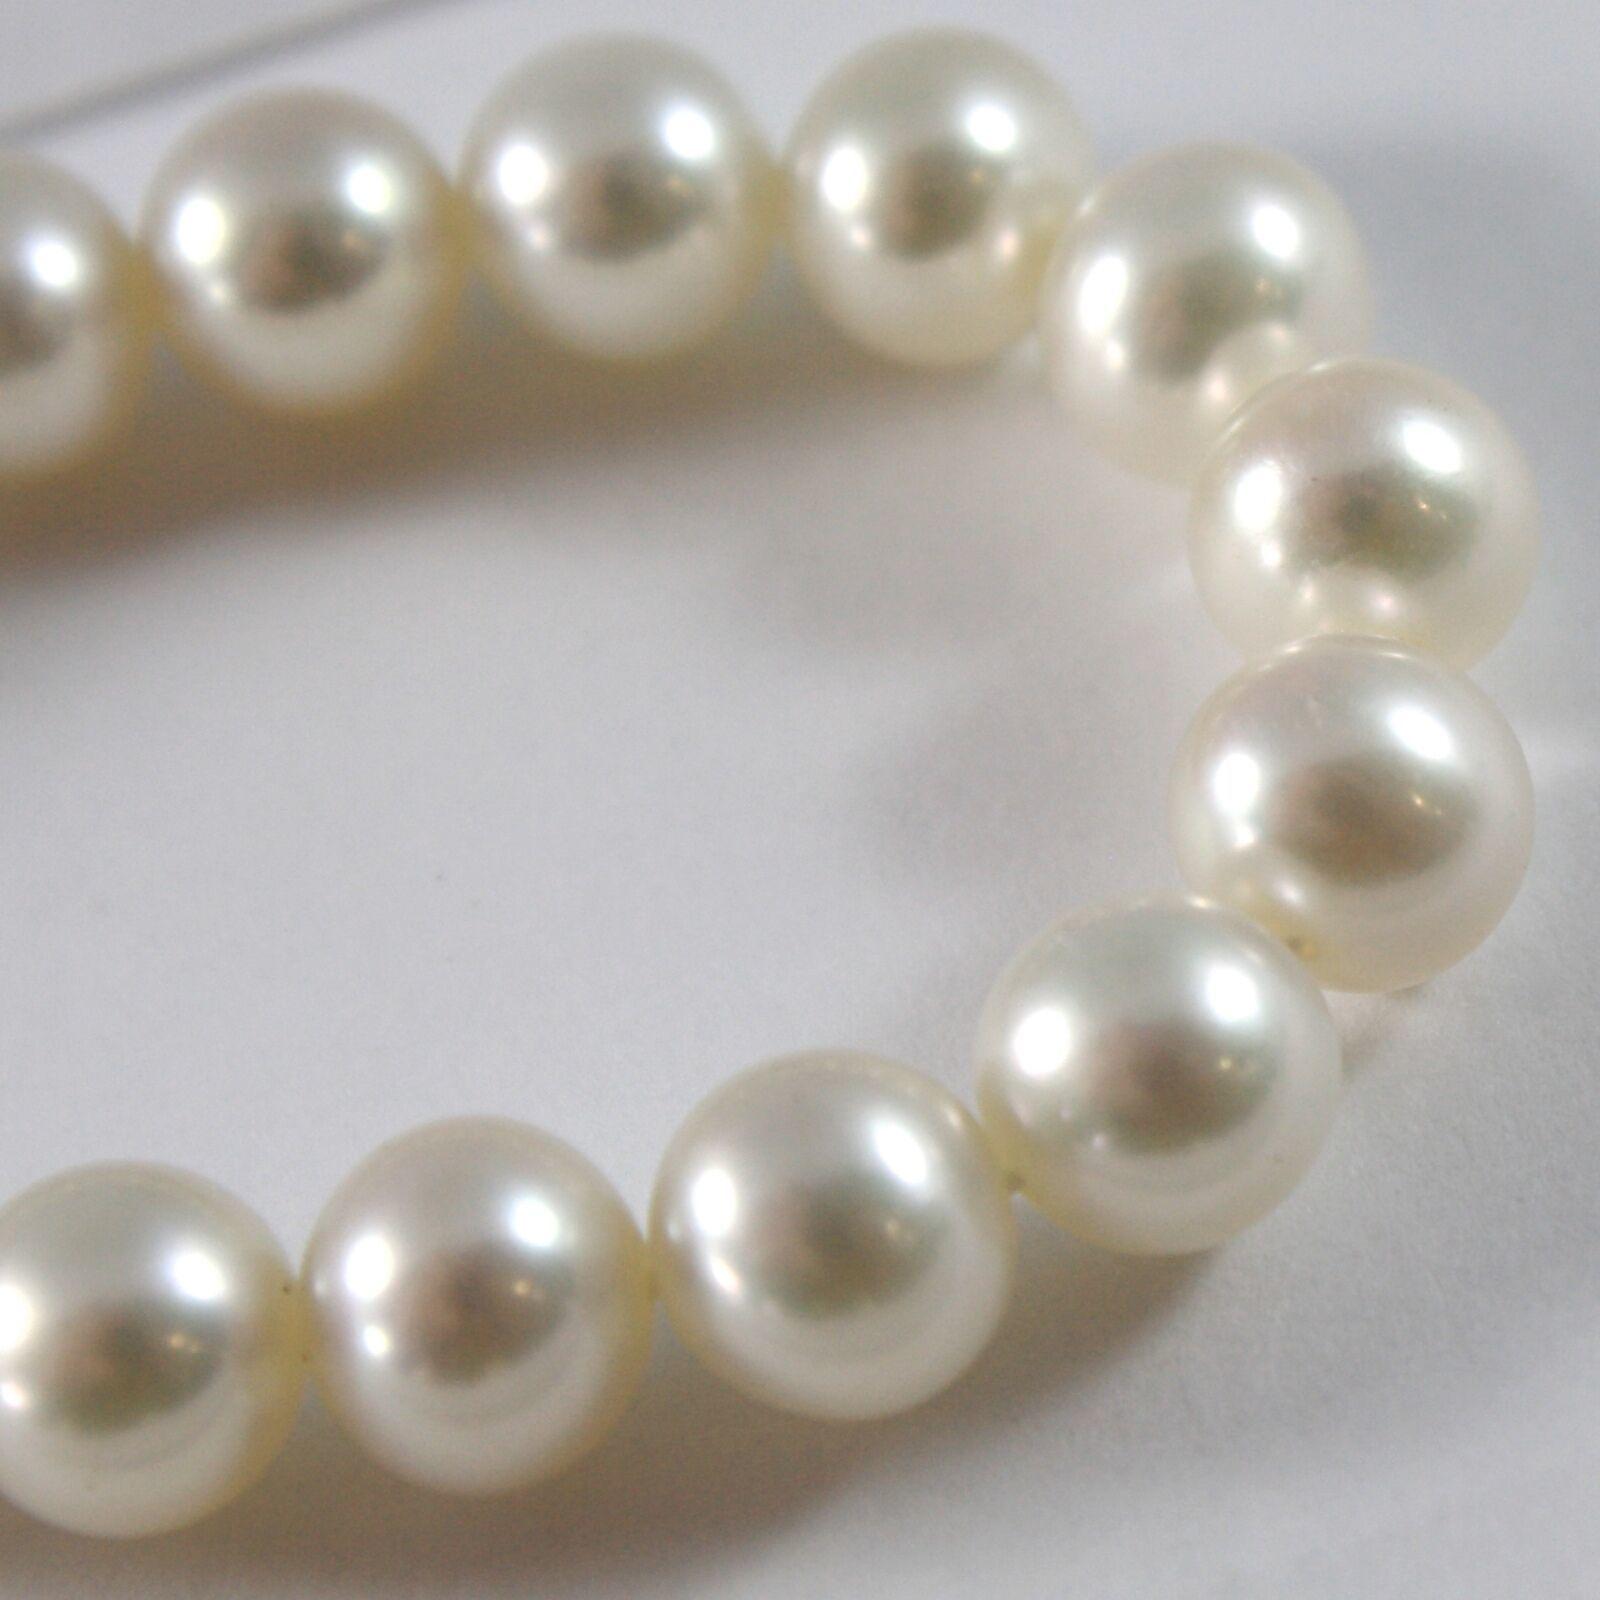 Pulsera Oro Blanco 750 18 CT, Collar de Perlas Blancas Diámetro 8mm, Largo 19 CM